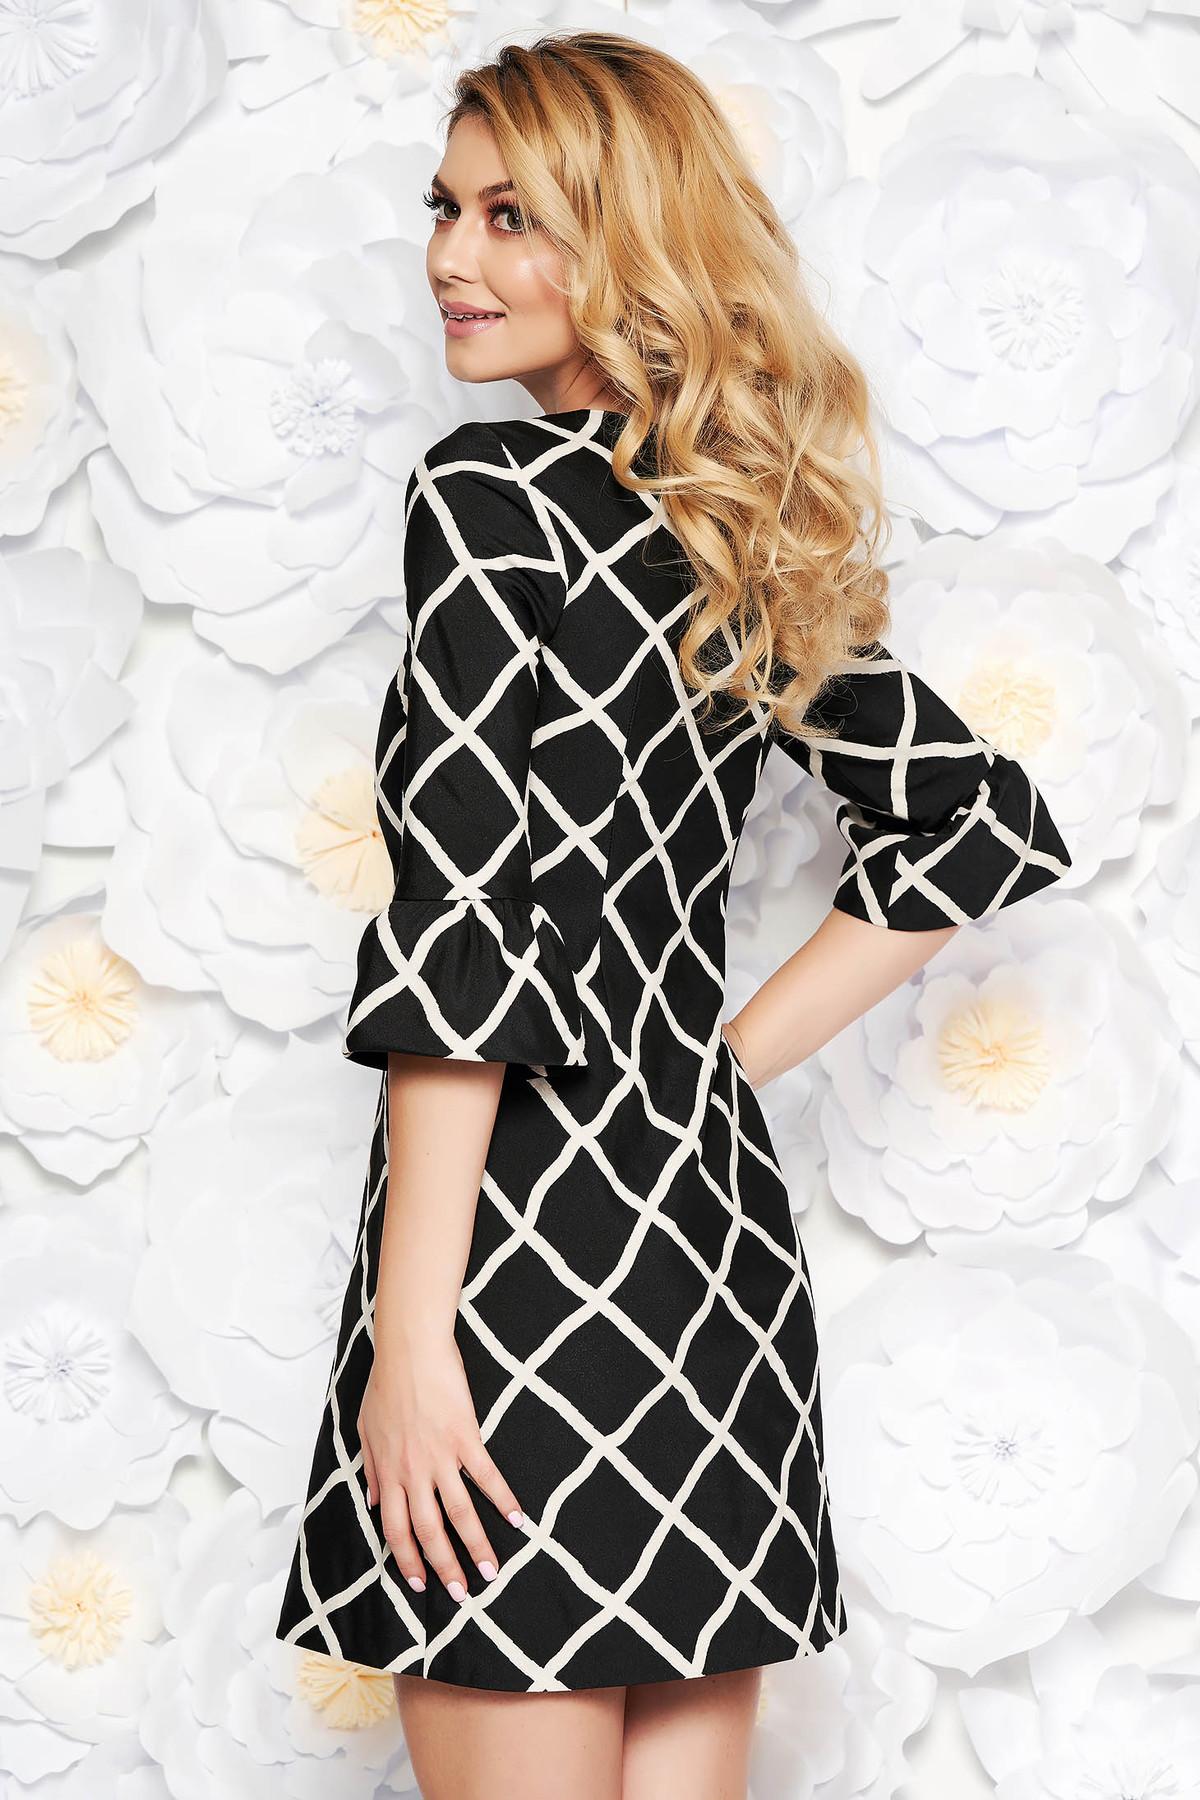 Rochie neagra eleganta din bumbac usor elastic captusita pe interior cu maneci clopot